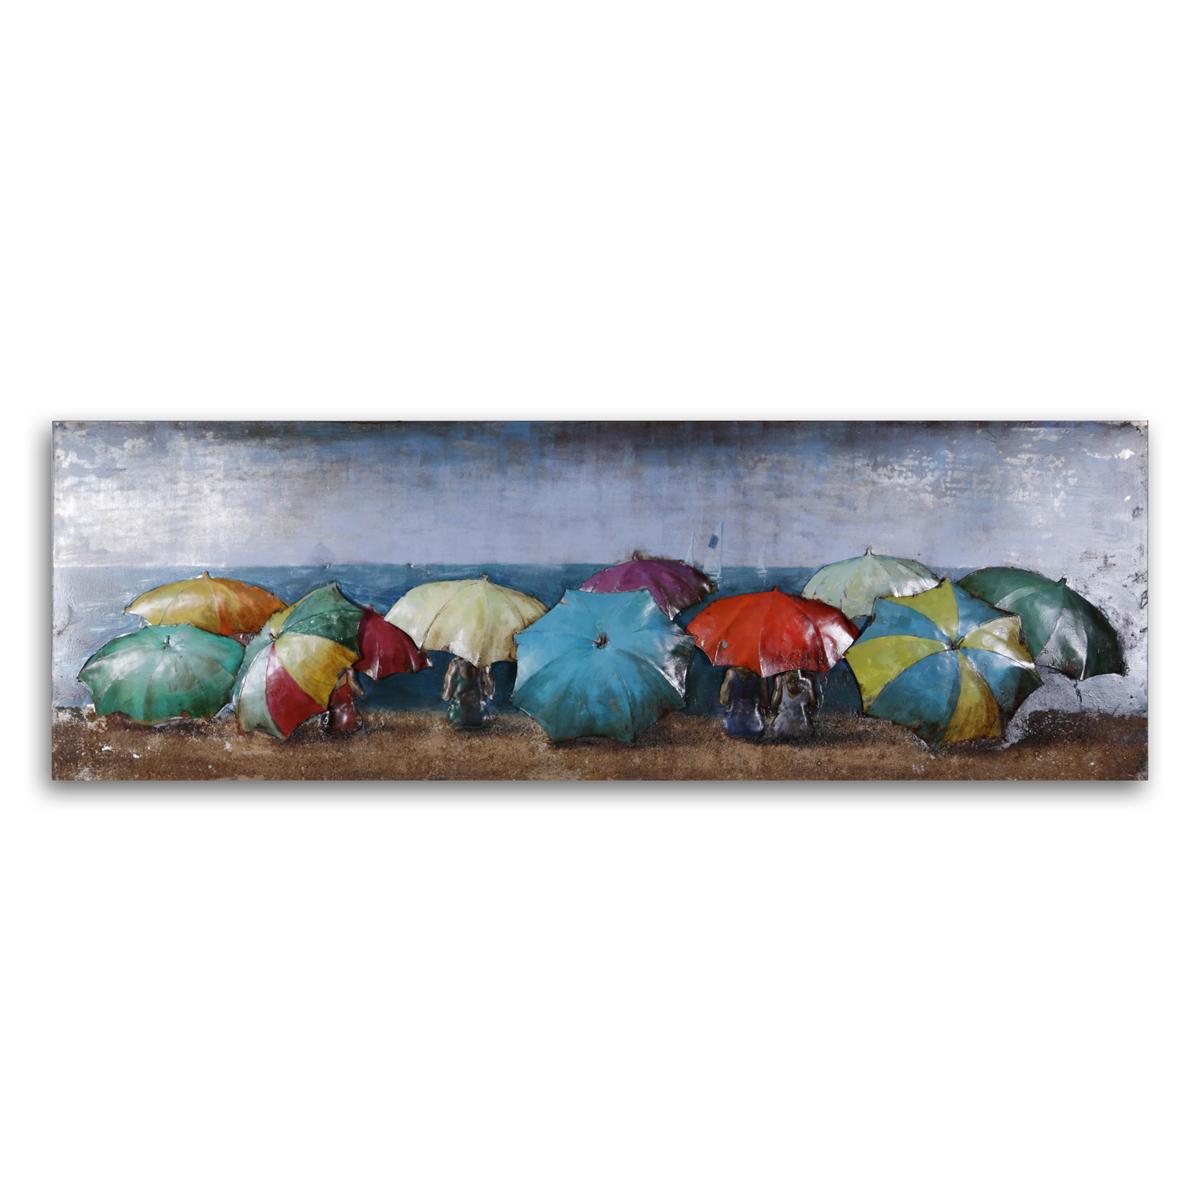 Beach Wall Art: Beach Umbrellas Metal Wall Art Within Most Popular Bella Beach Umbrellas (View 13 of 20)